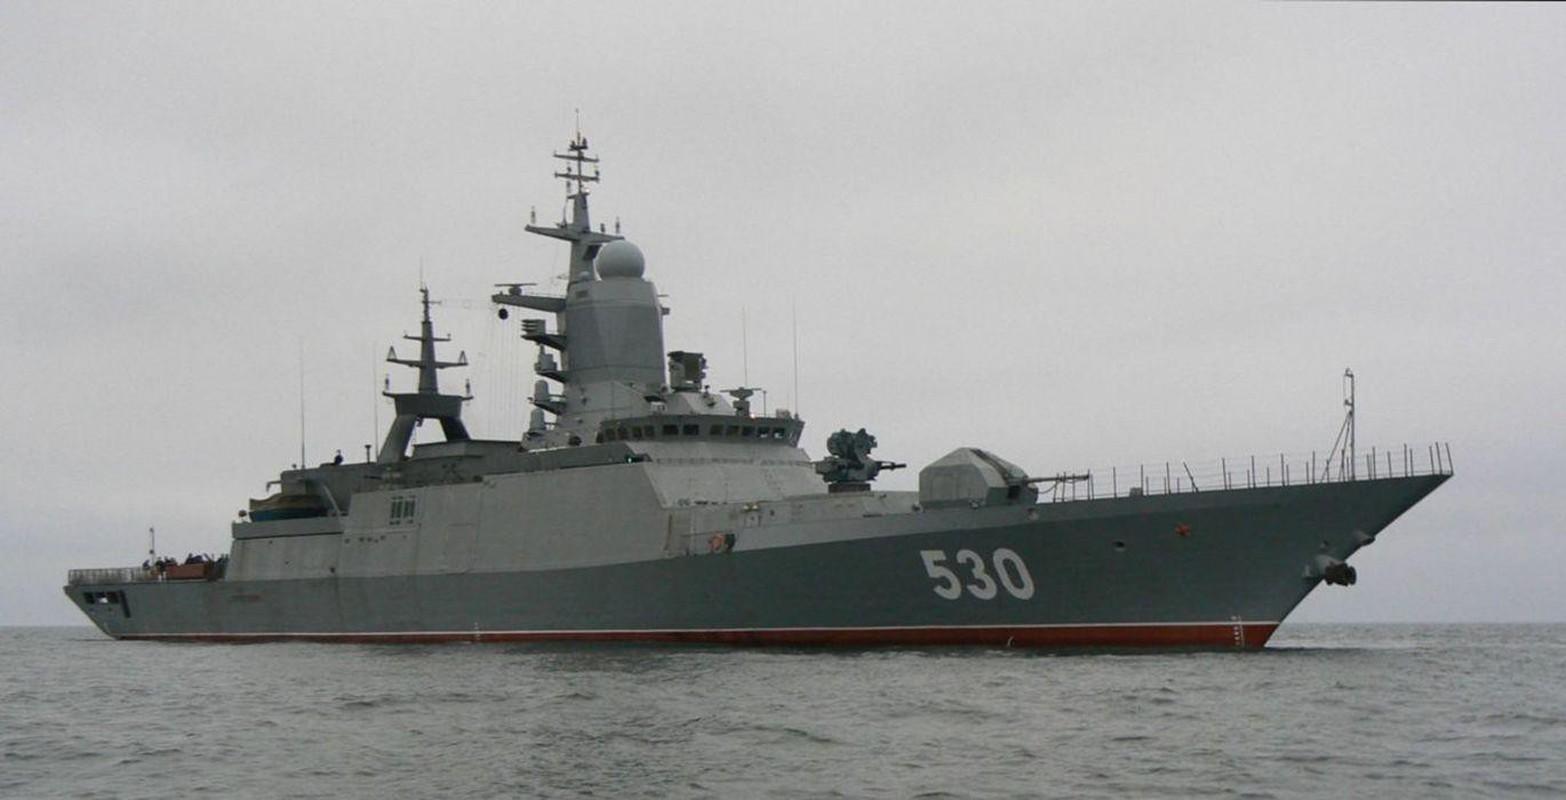 Ukraine giup My vo hieu hoa kha nang nham ban cua tau chien Nga - Trung Quoc-Hinh-7